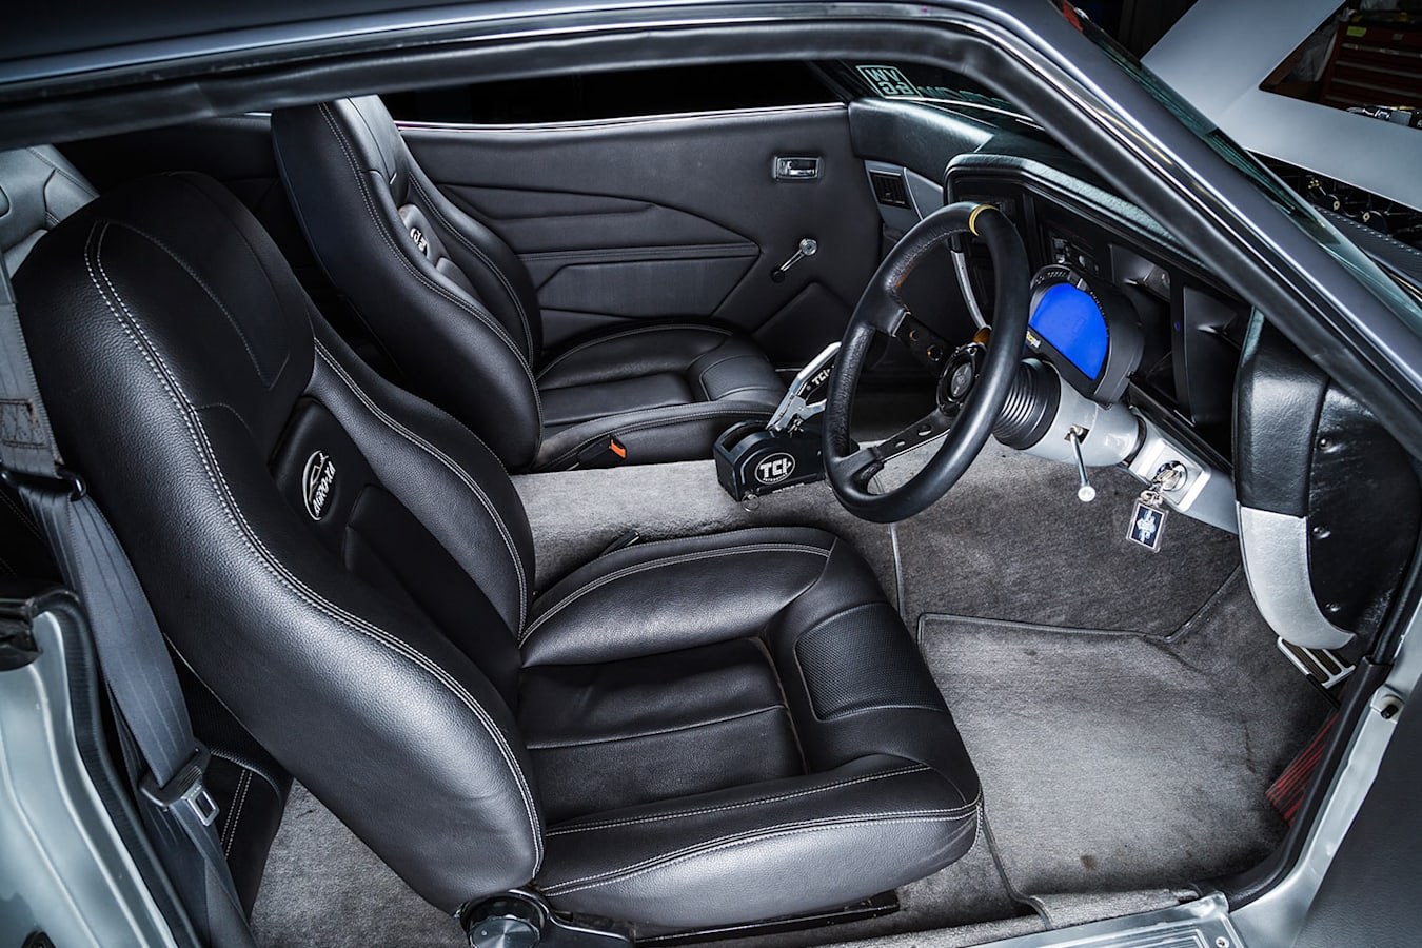 Ford FAlcon XA coupe interior front